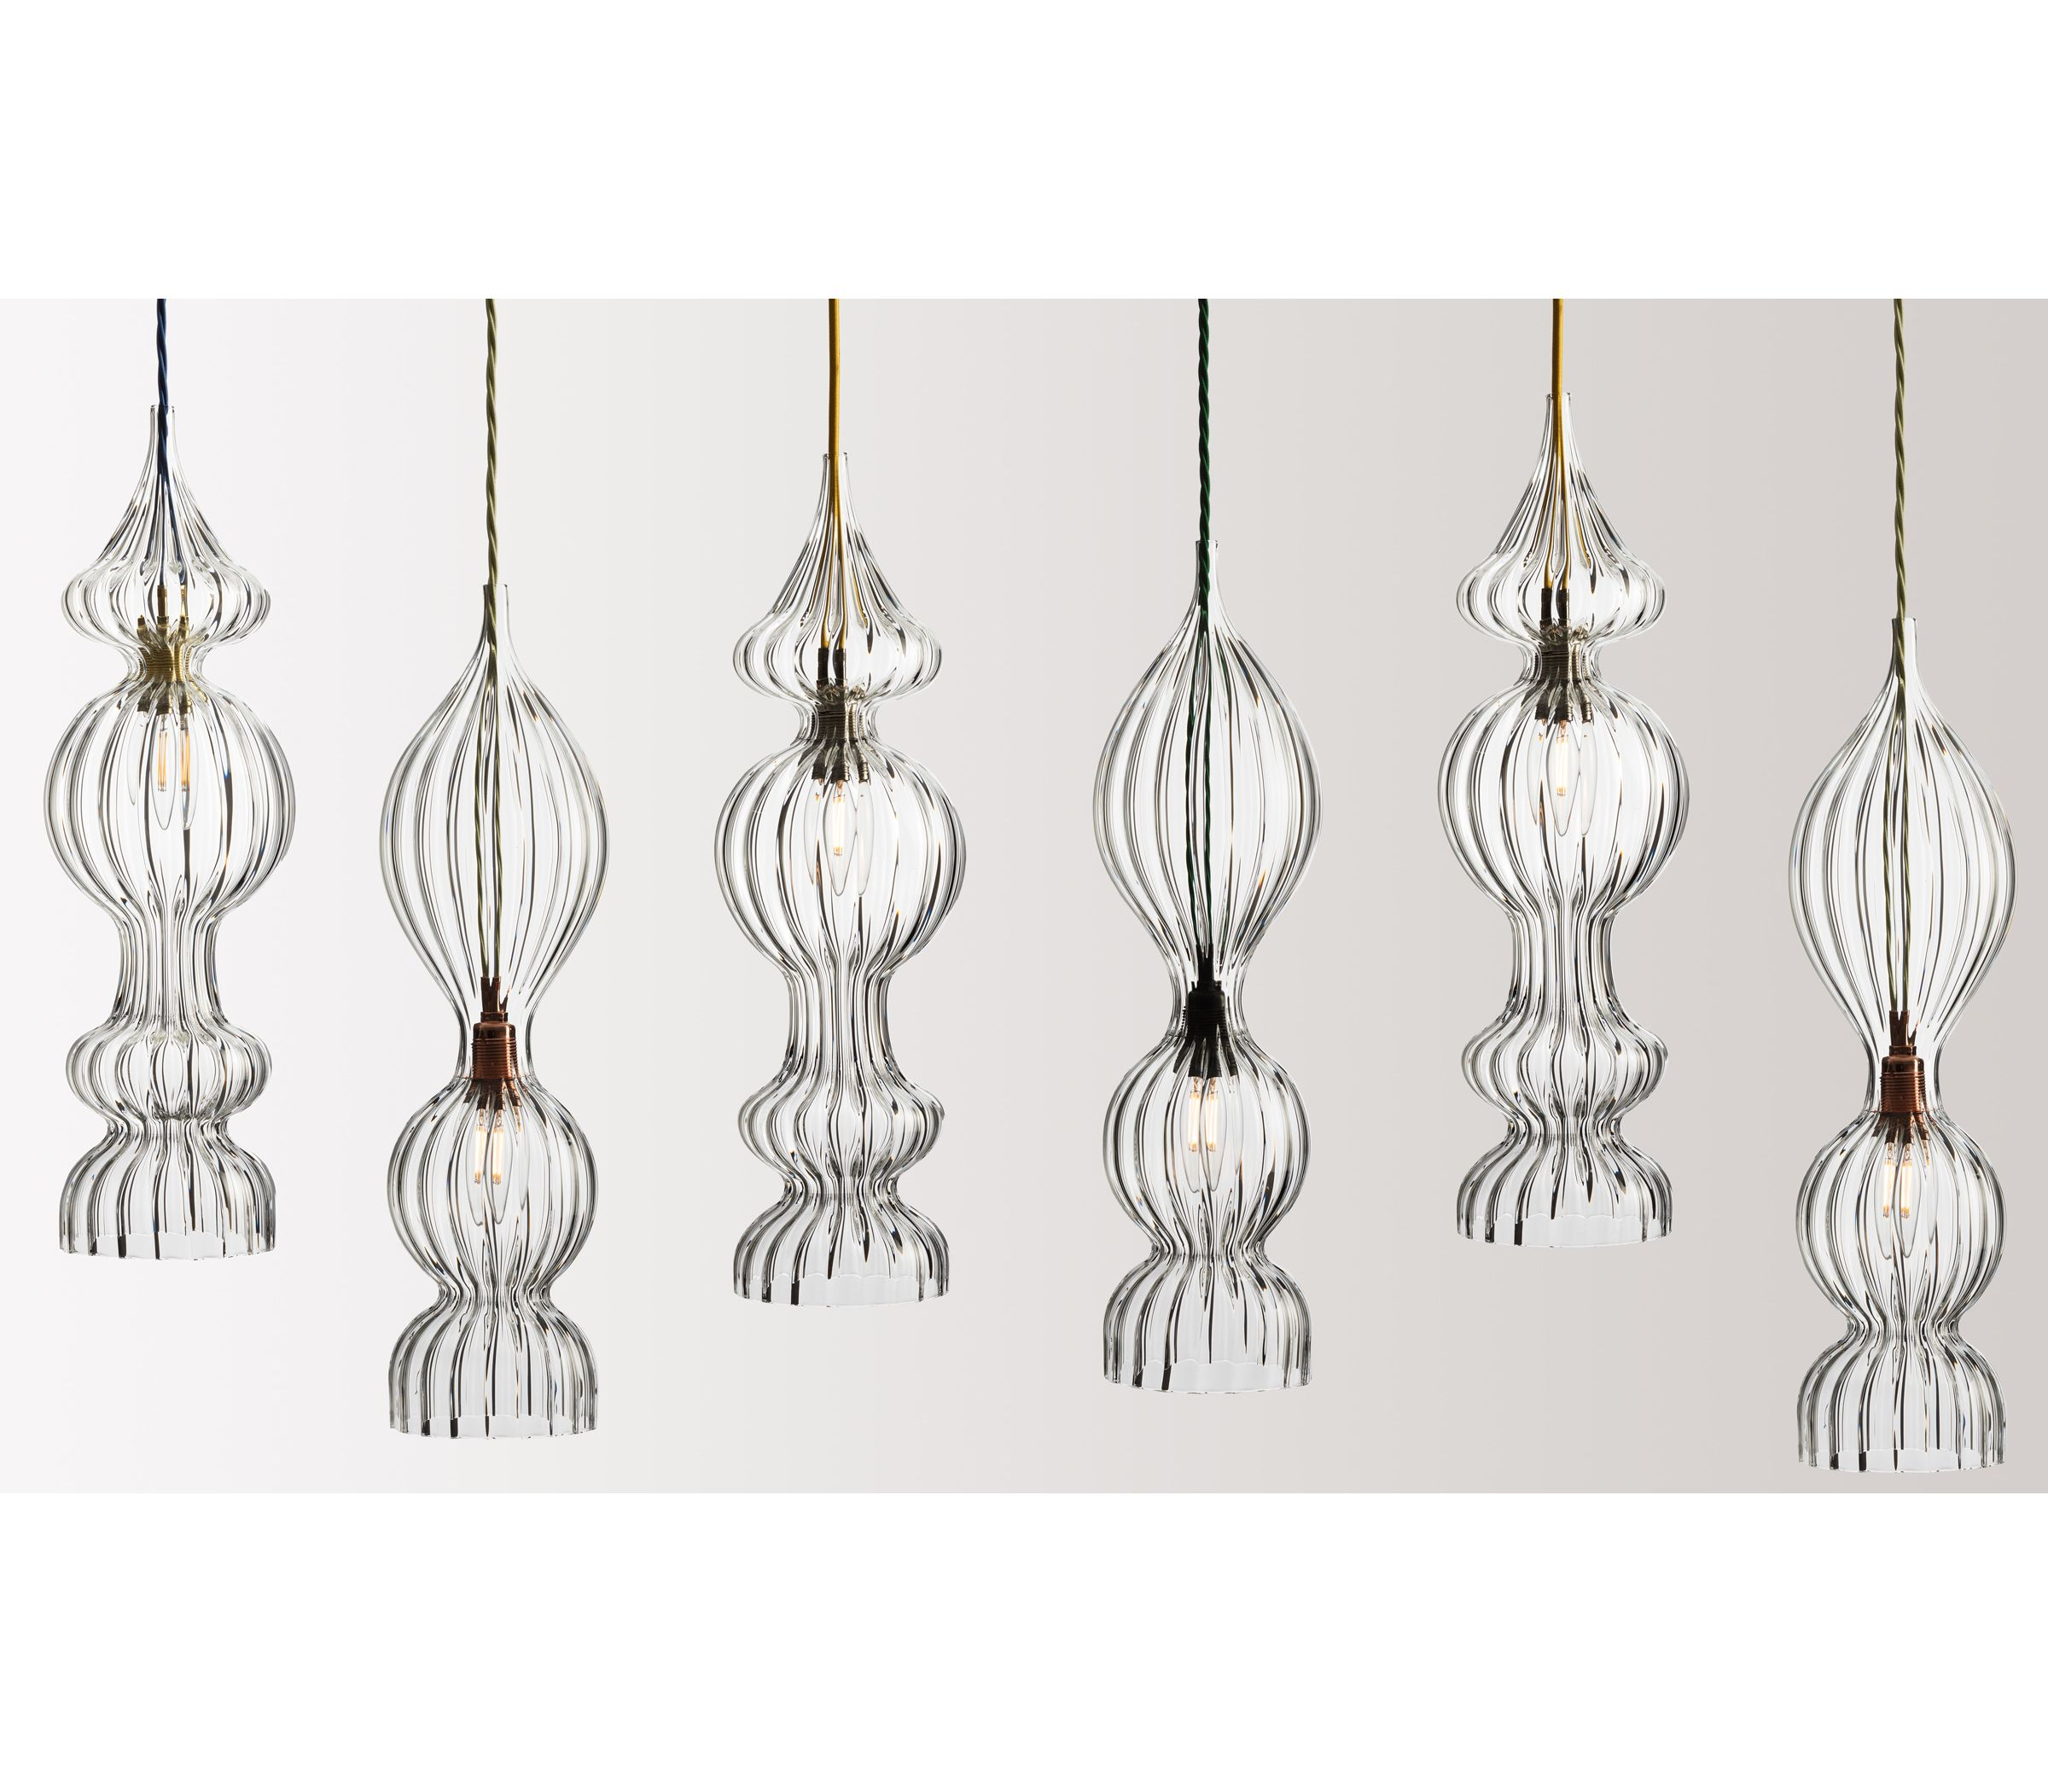 Rothschild&Bickers Подвесной светильник Spindle Pendant